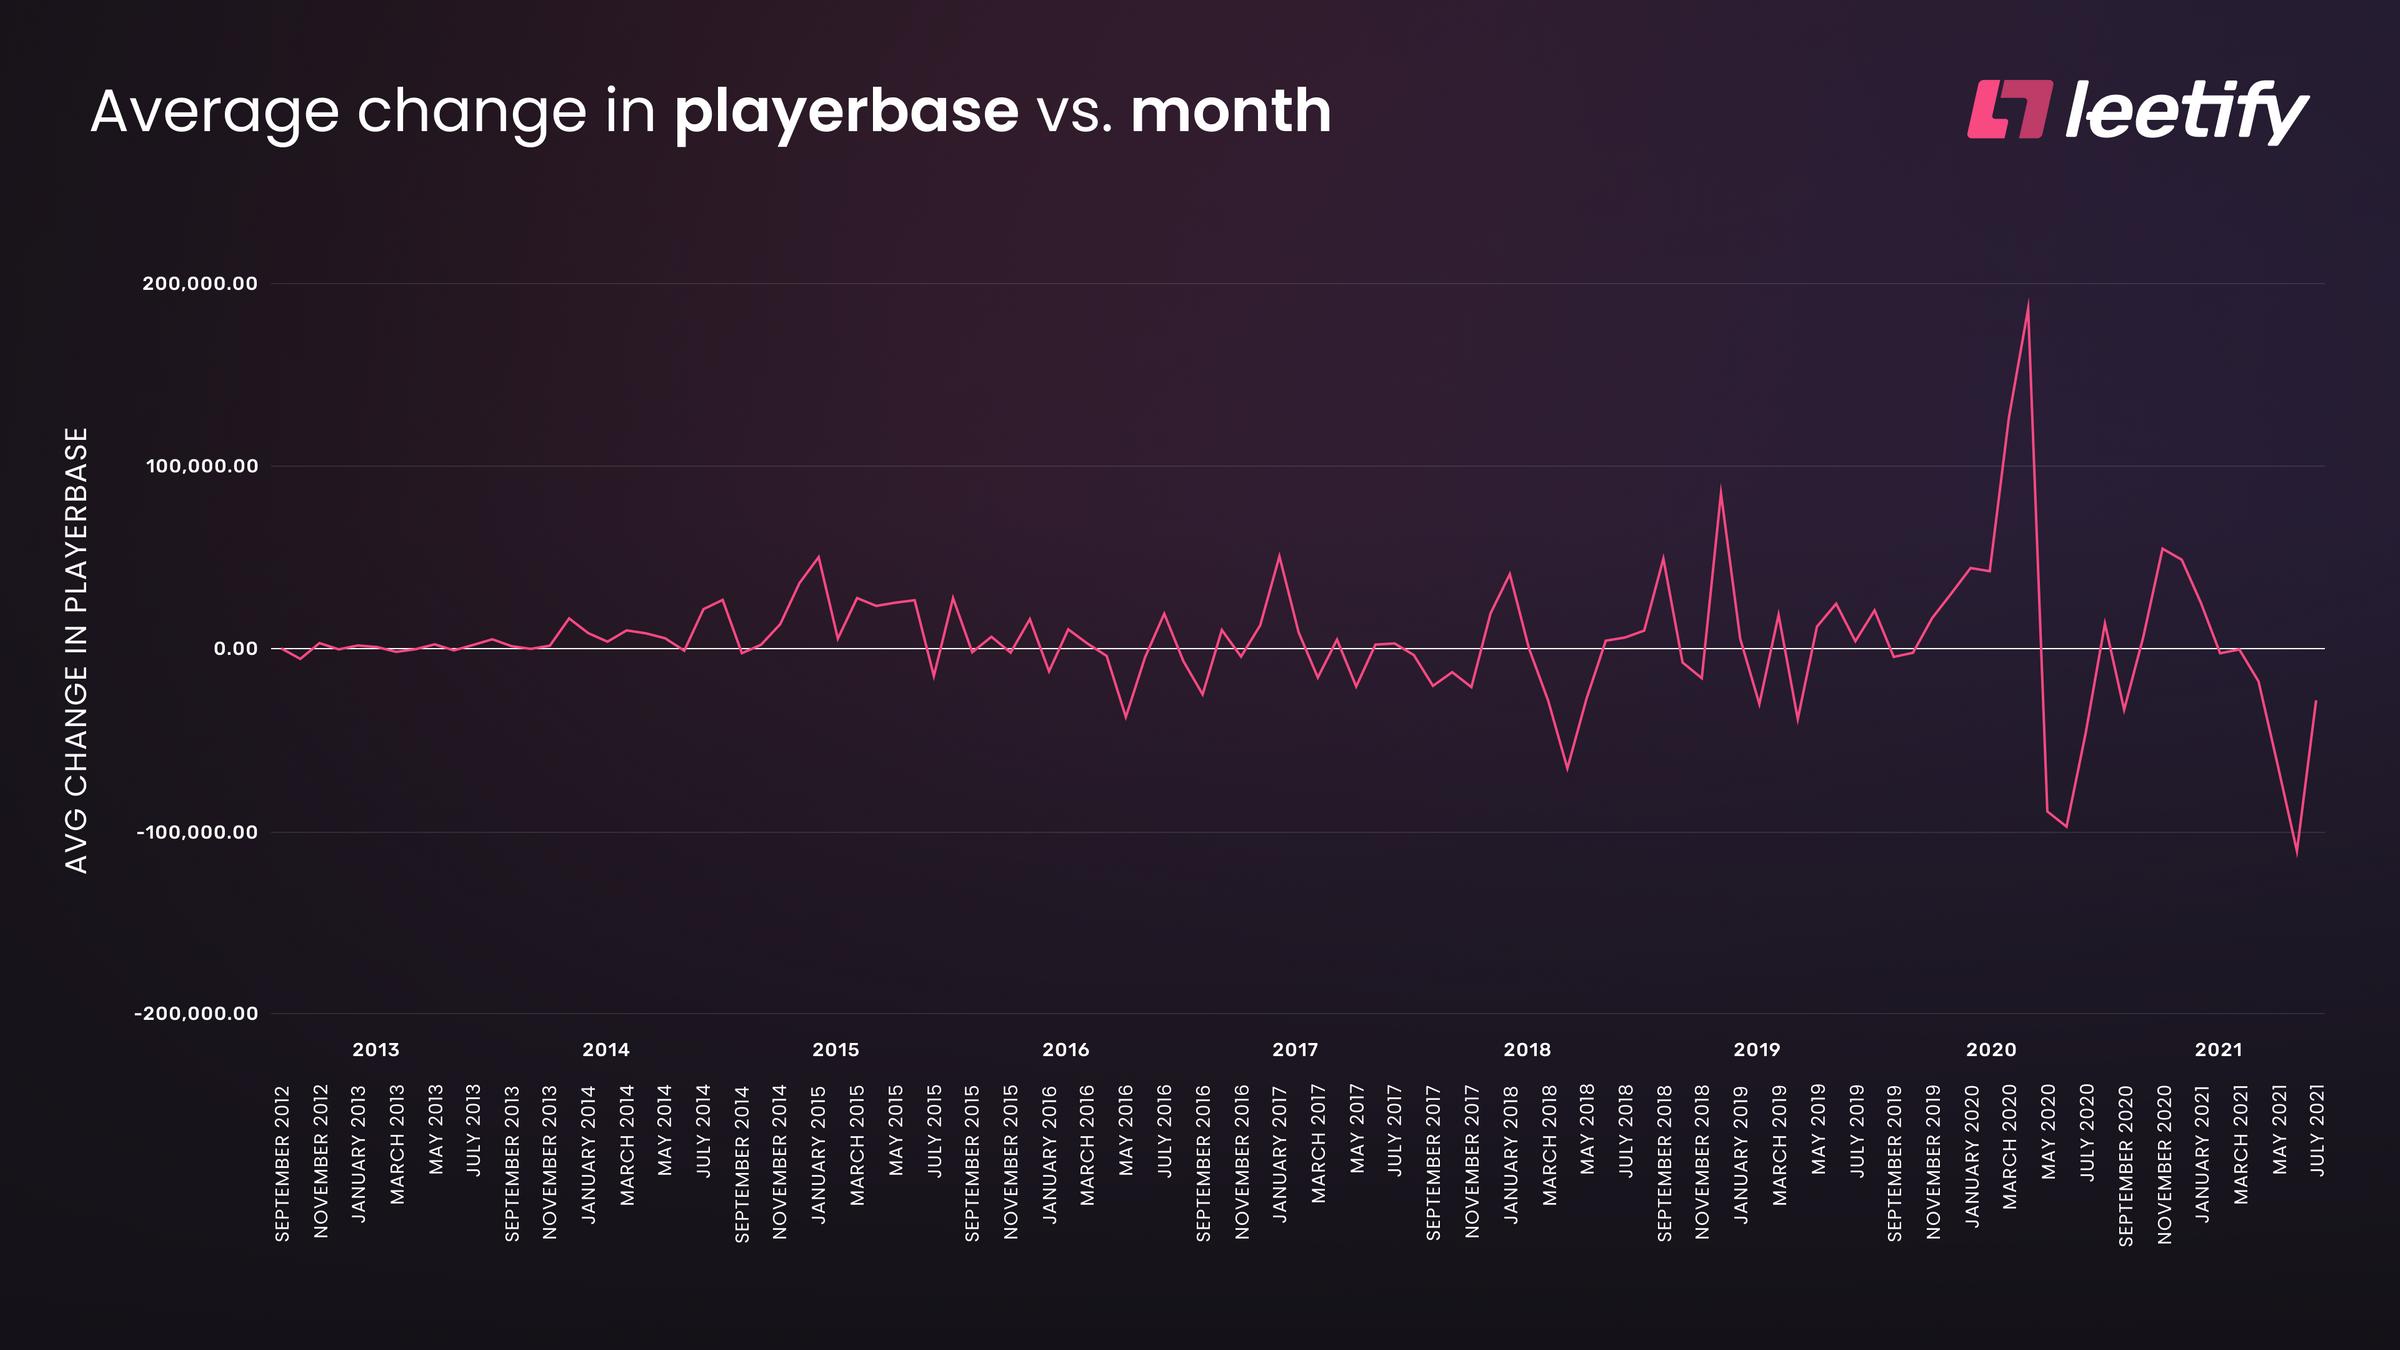 CSGO Average Change in Playerbase per Month